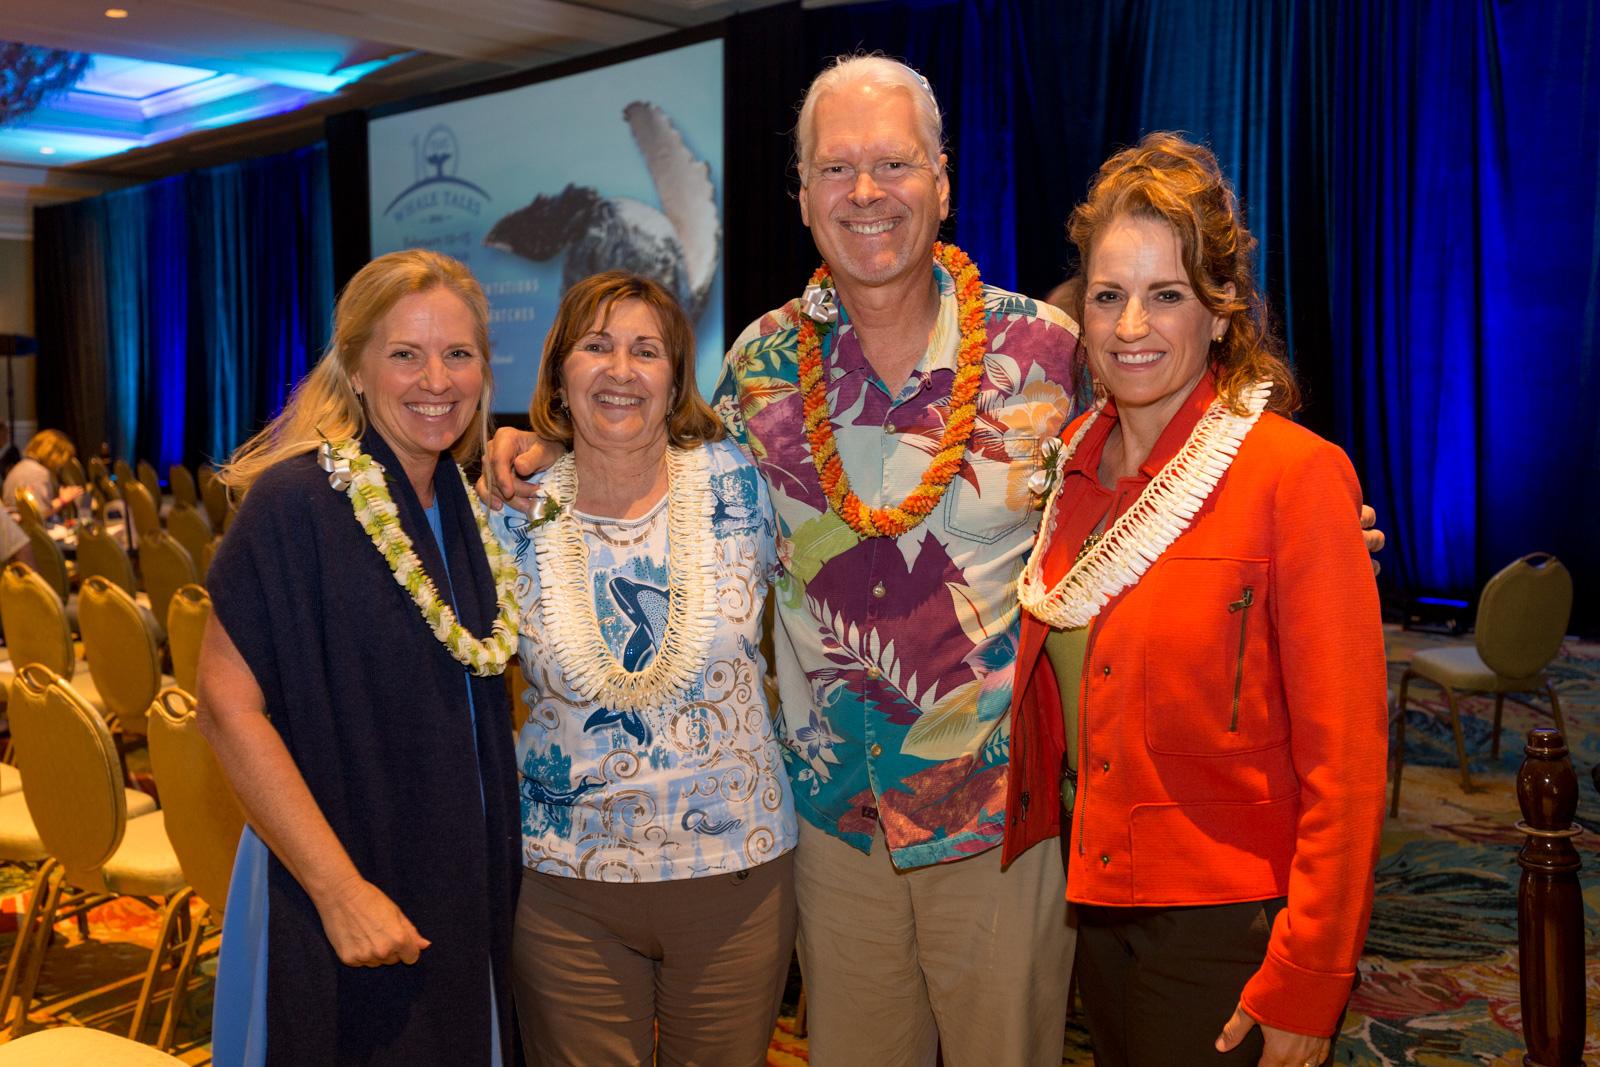 Whale Trust Co-Founder Meagan jones, Ph.D. with the Makana Aloha 'ohana